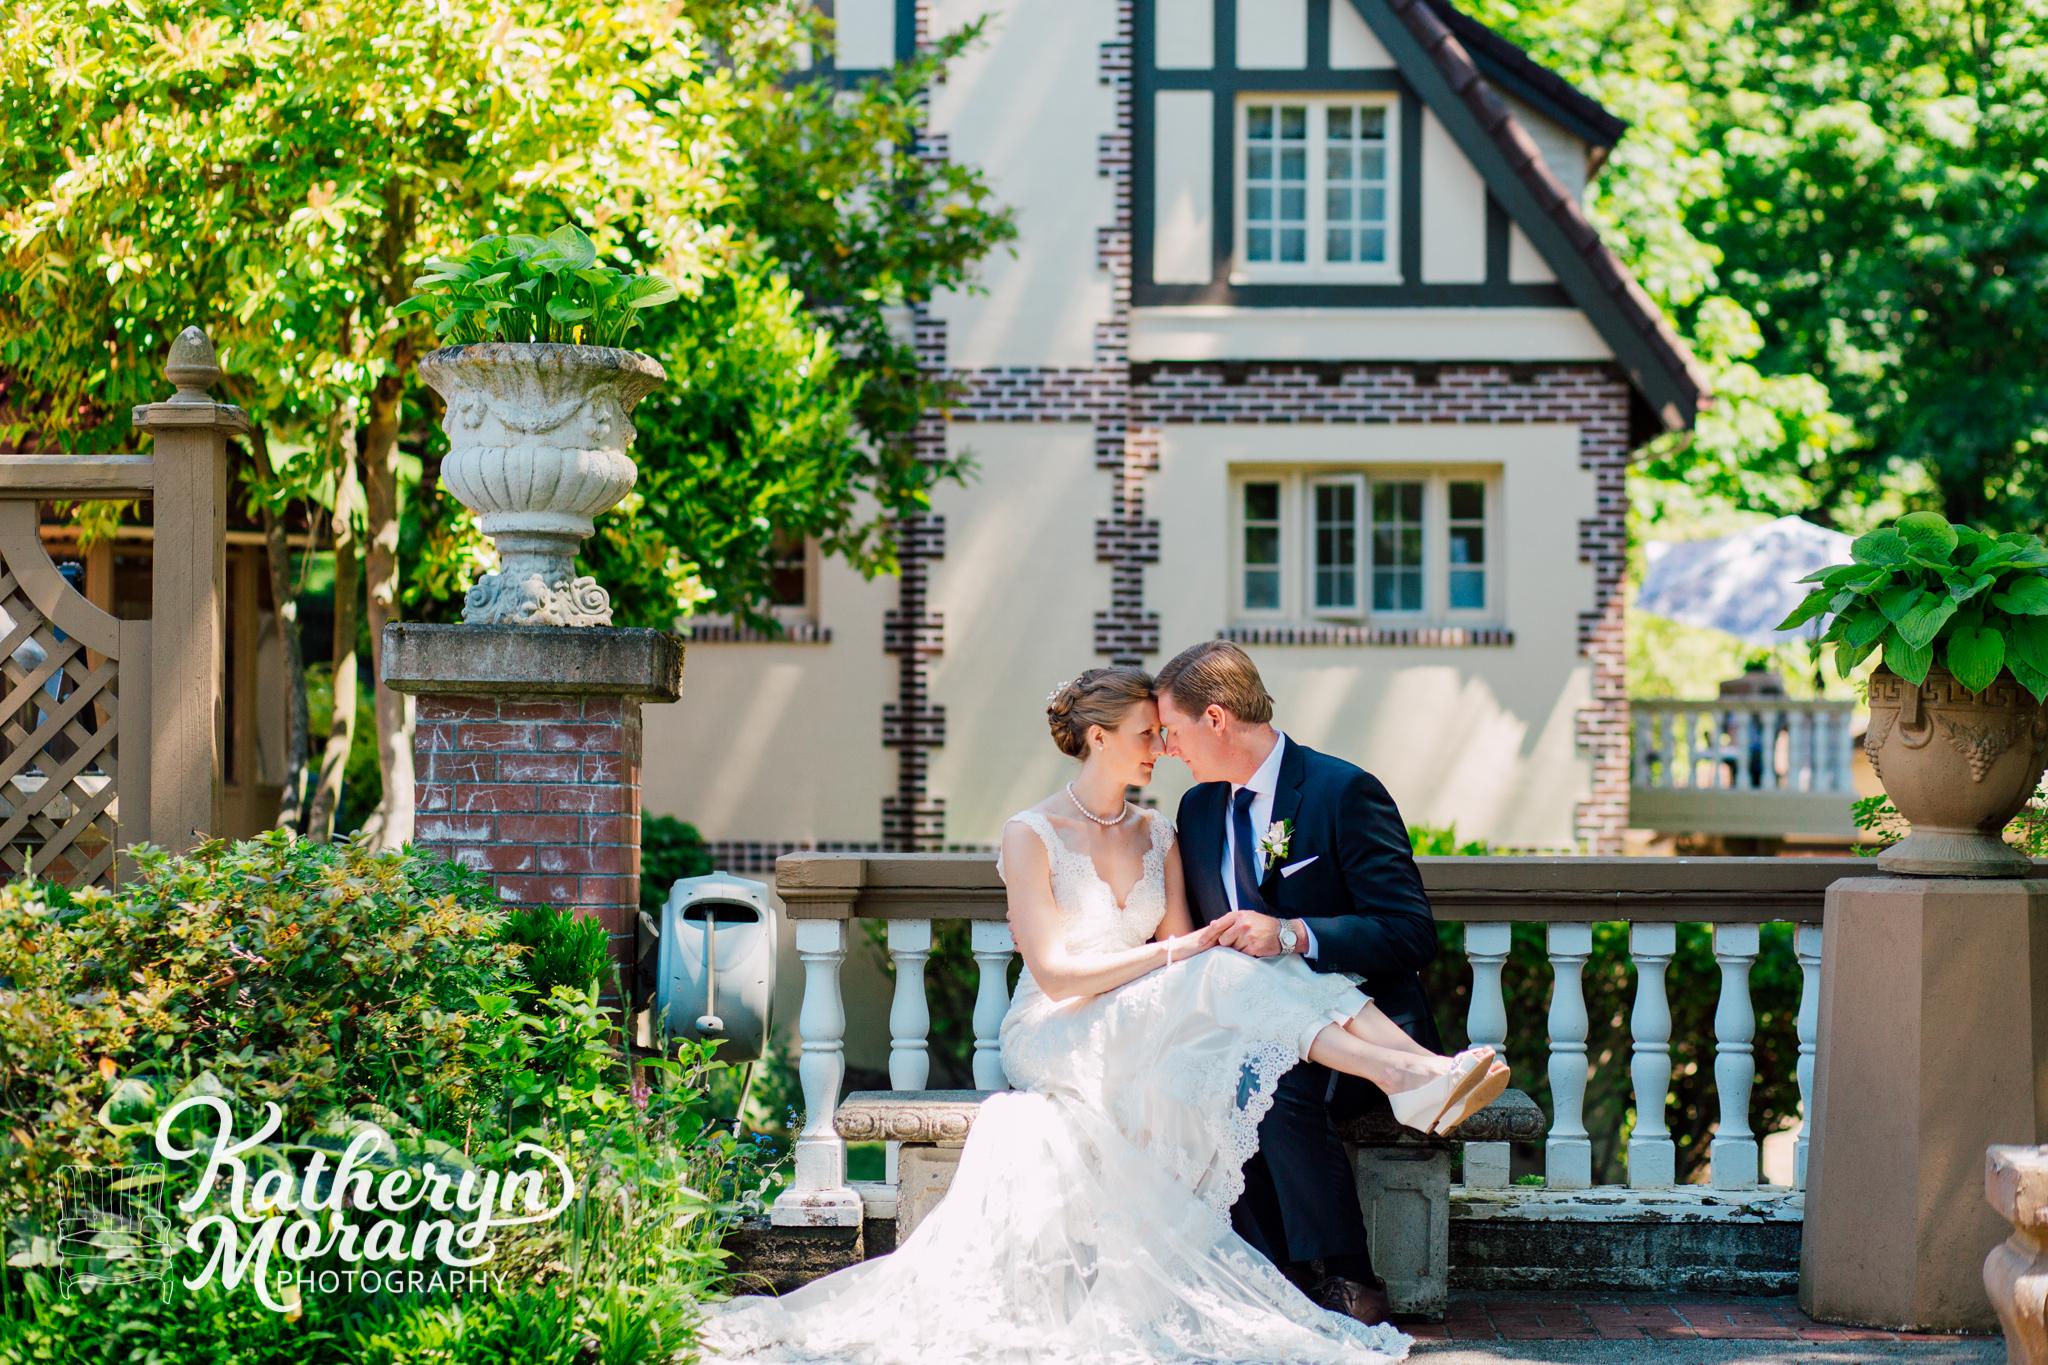 bellingham-wedding-photographer-lairmont-manor-katheryn-moran-2.jpg